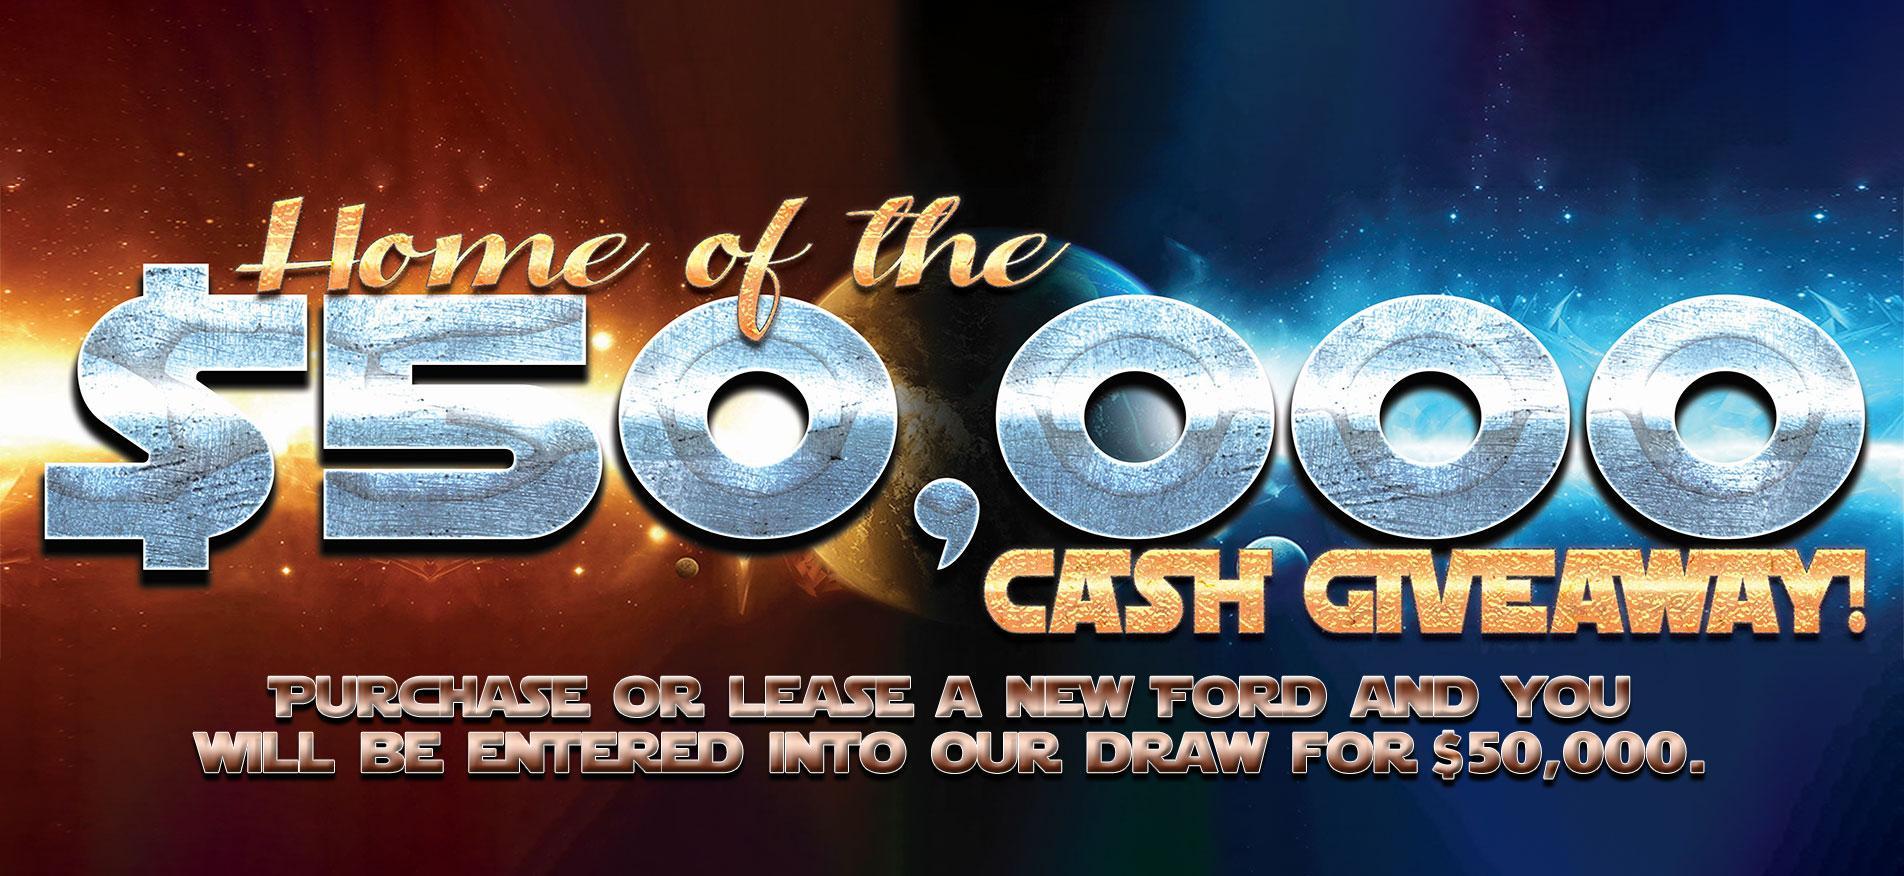 Cash Giveaway $50,000